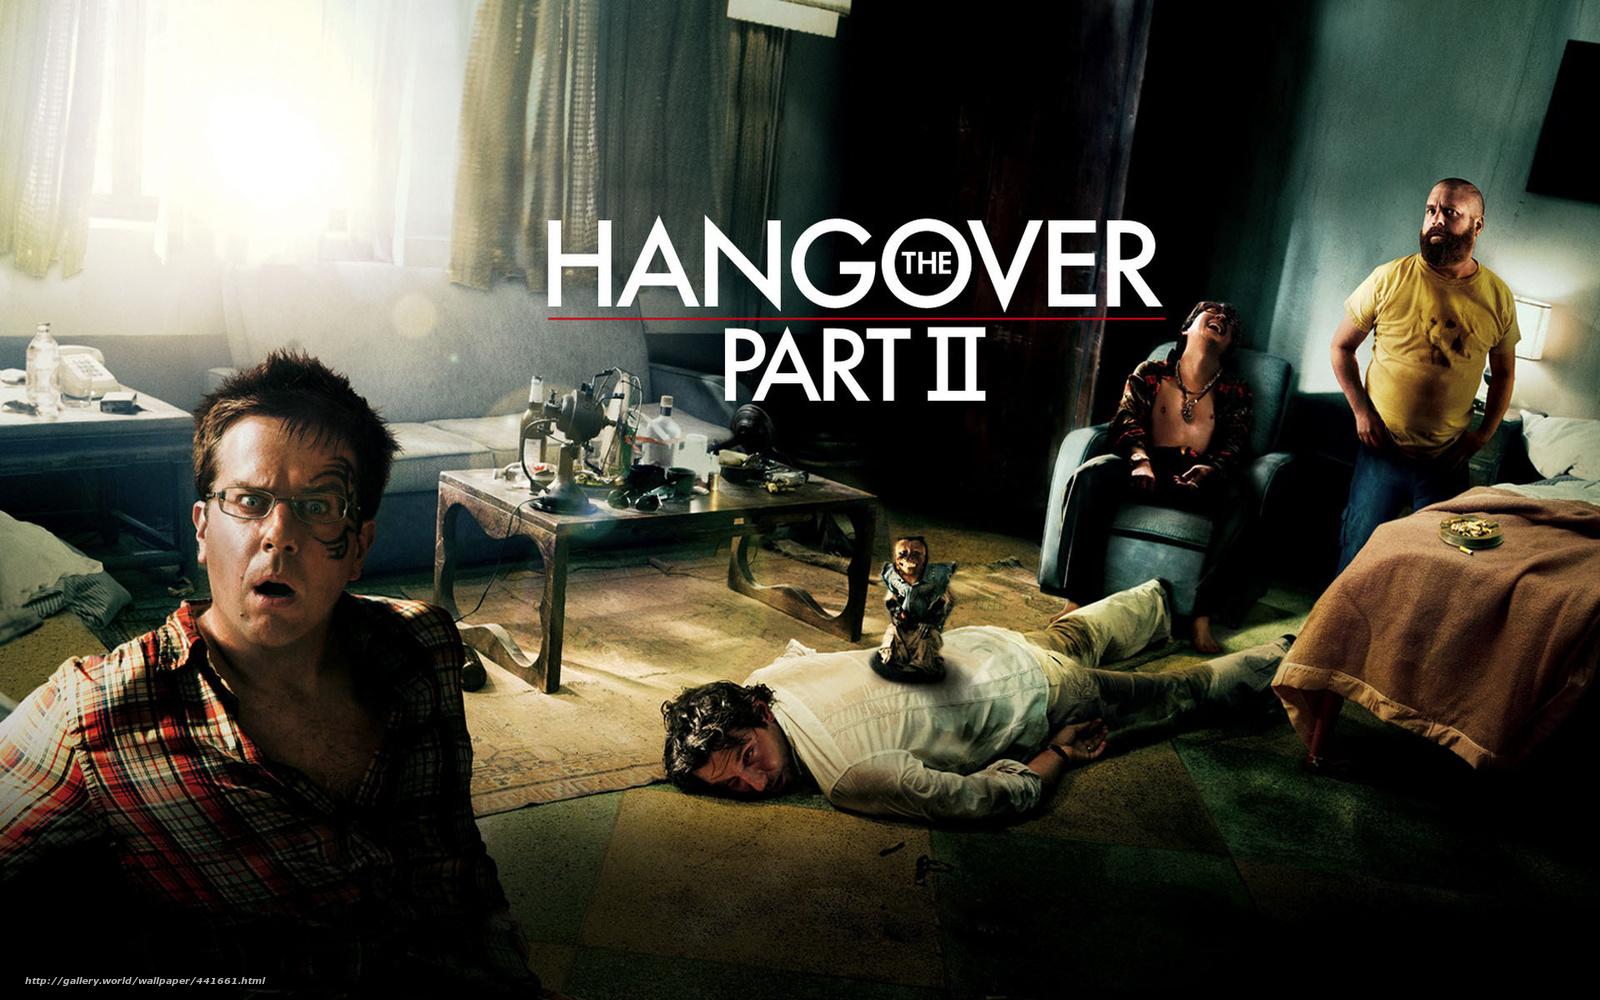 the hangover 2 from vegas to bangkok